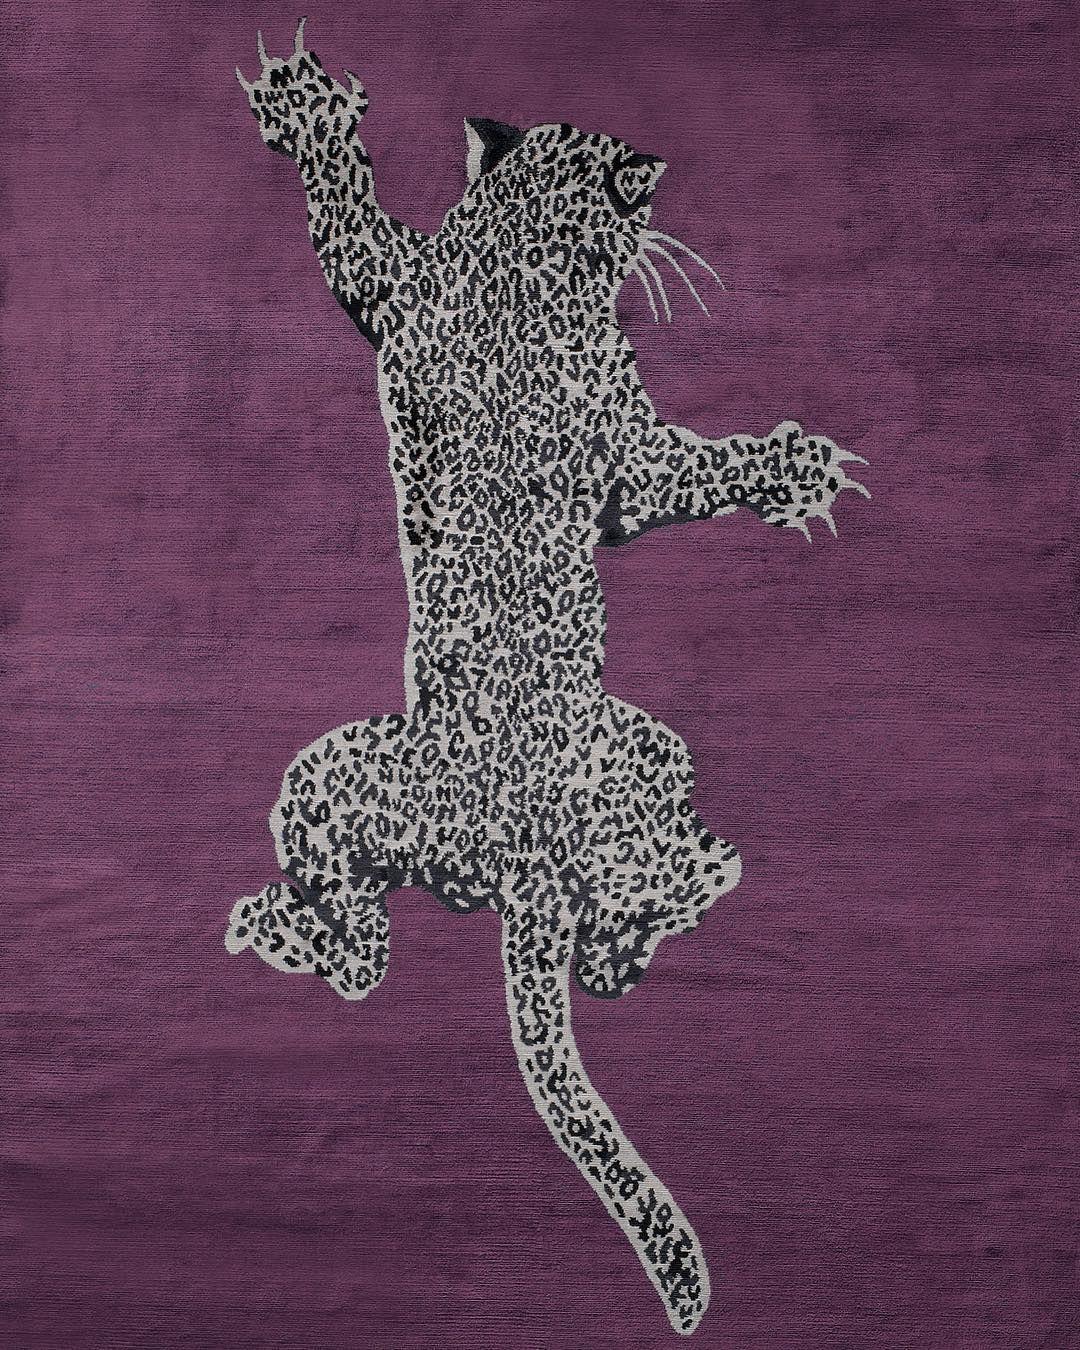 Animal Instinct A Custom Climbing Leopard By Dvf Hand